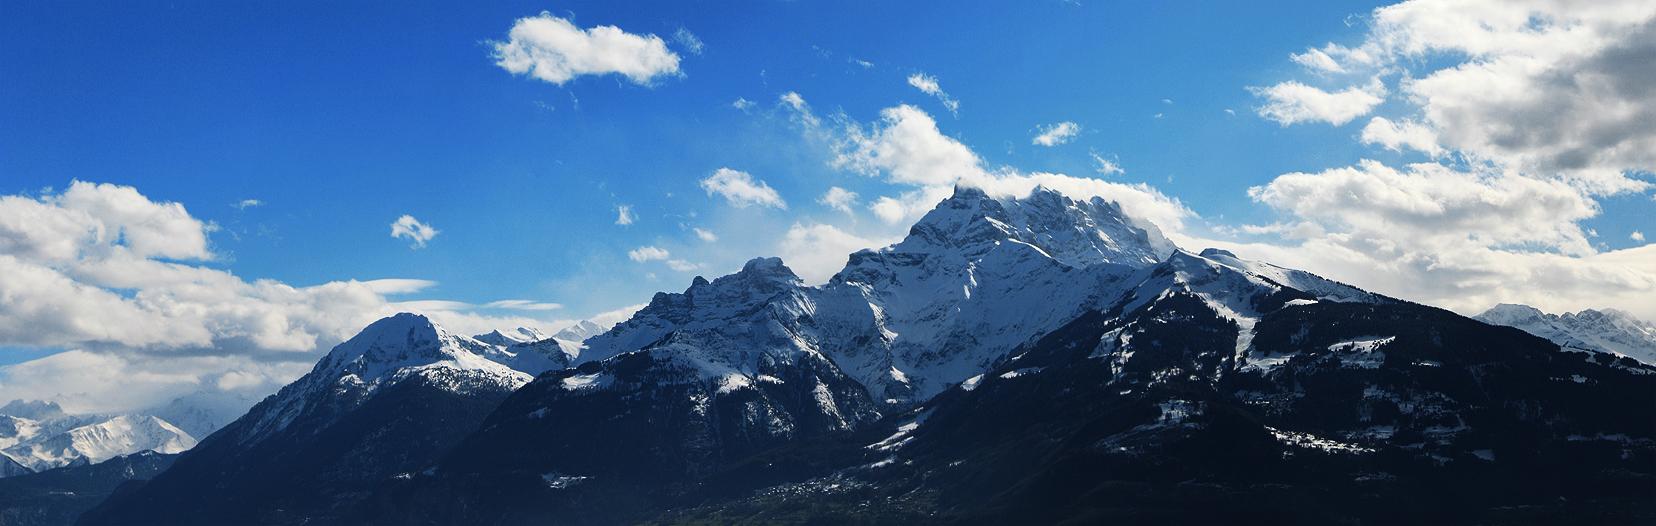 Dents Du Midi, Switzerland - 2012